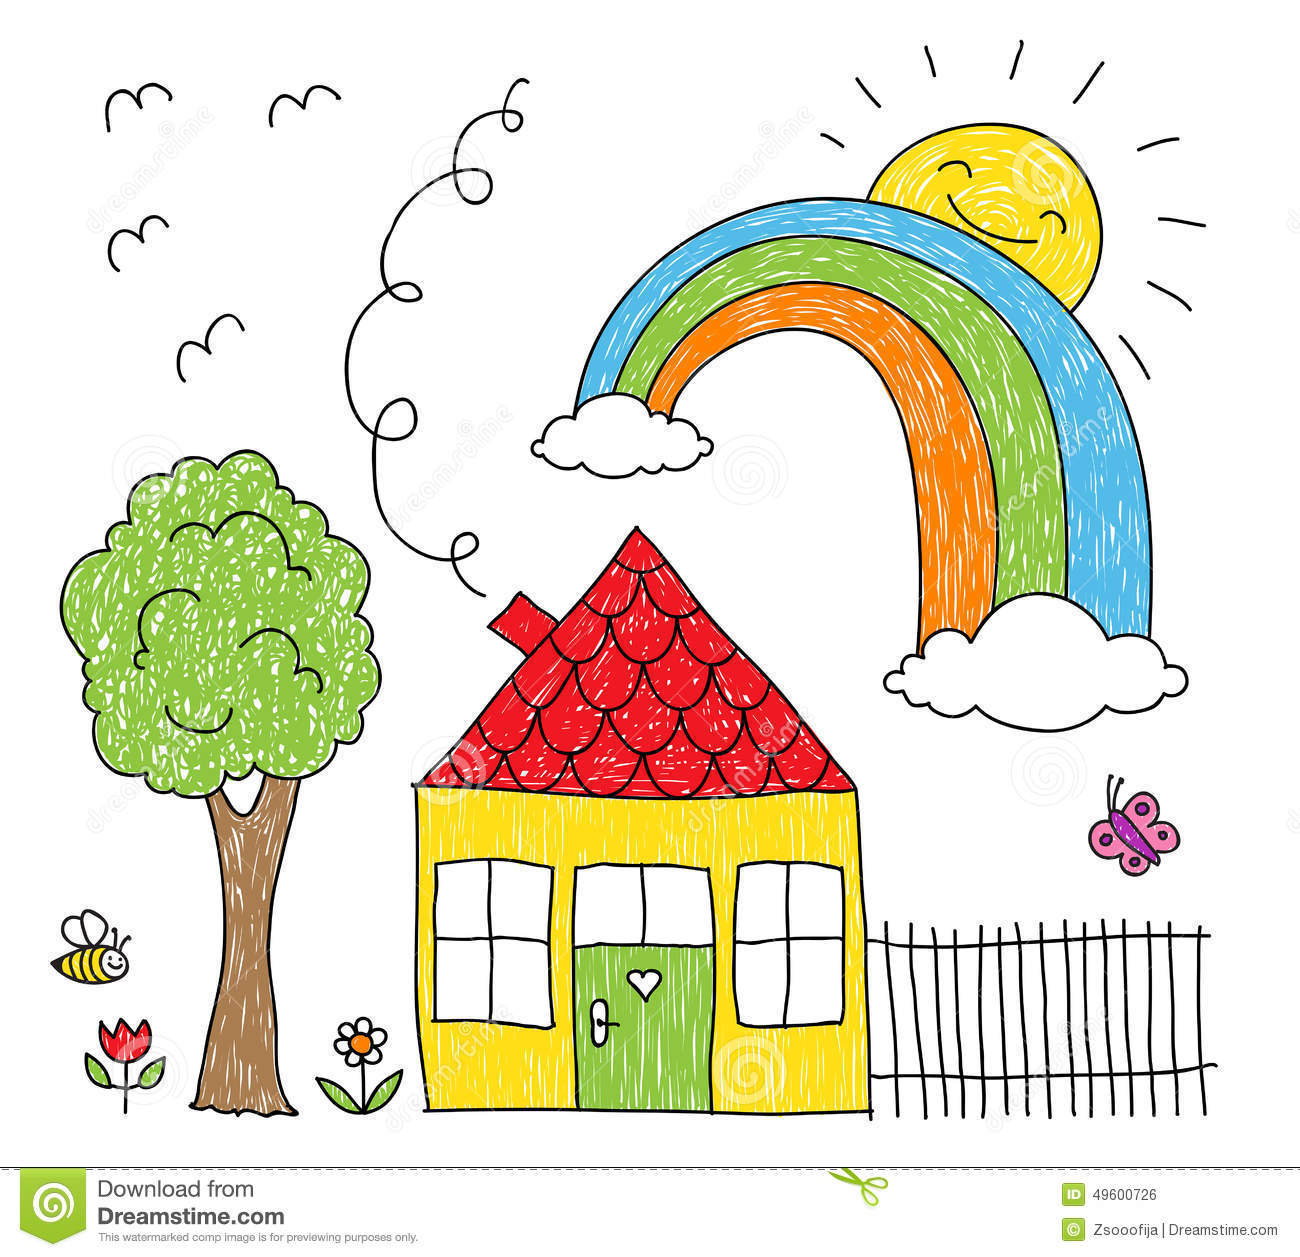 tiny house with rainbow